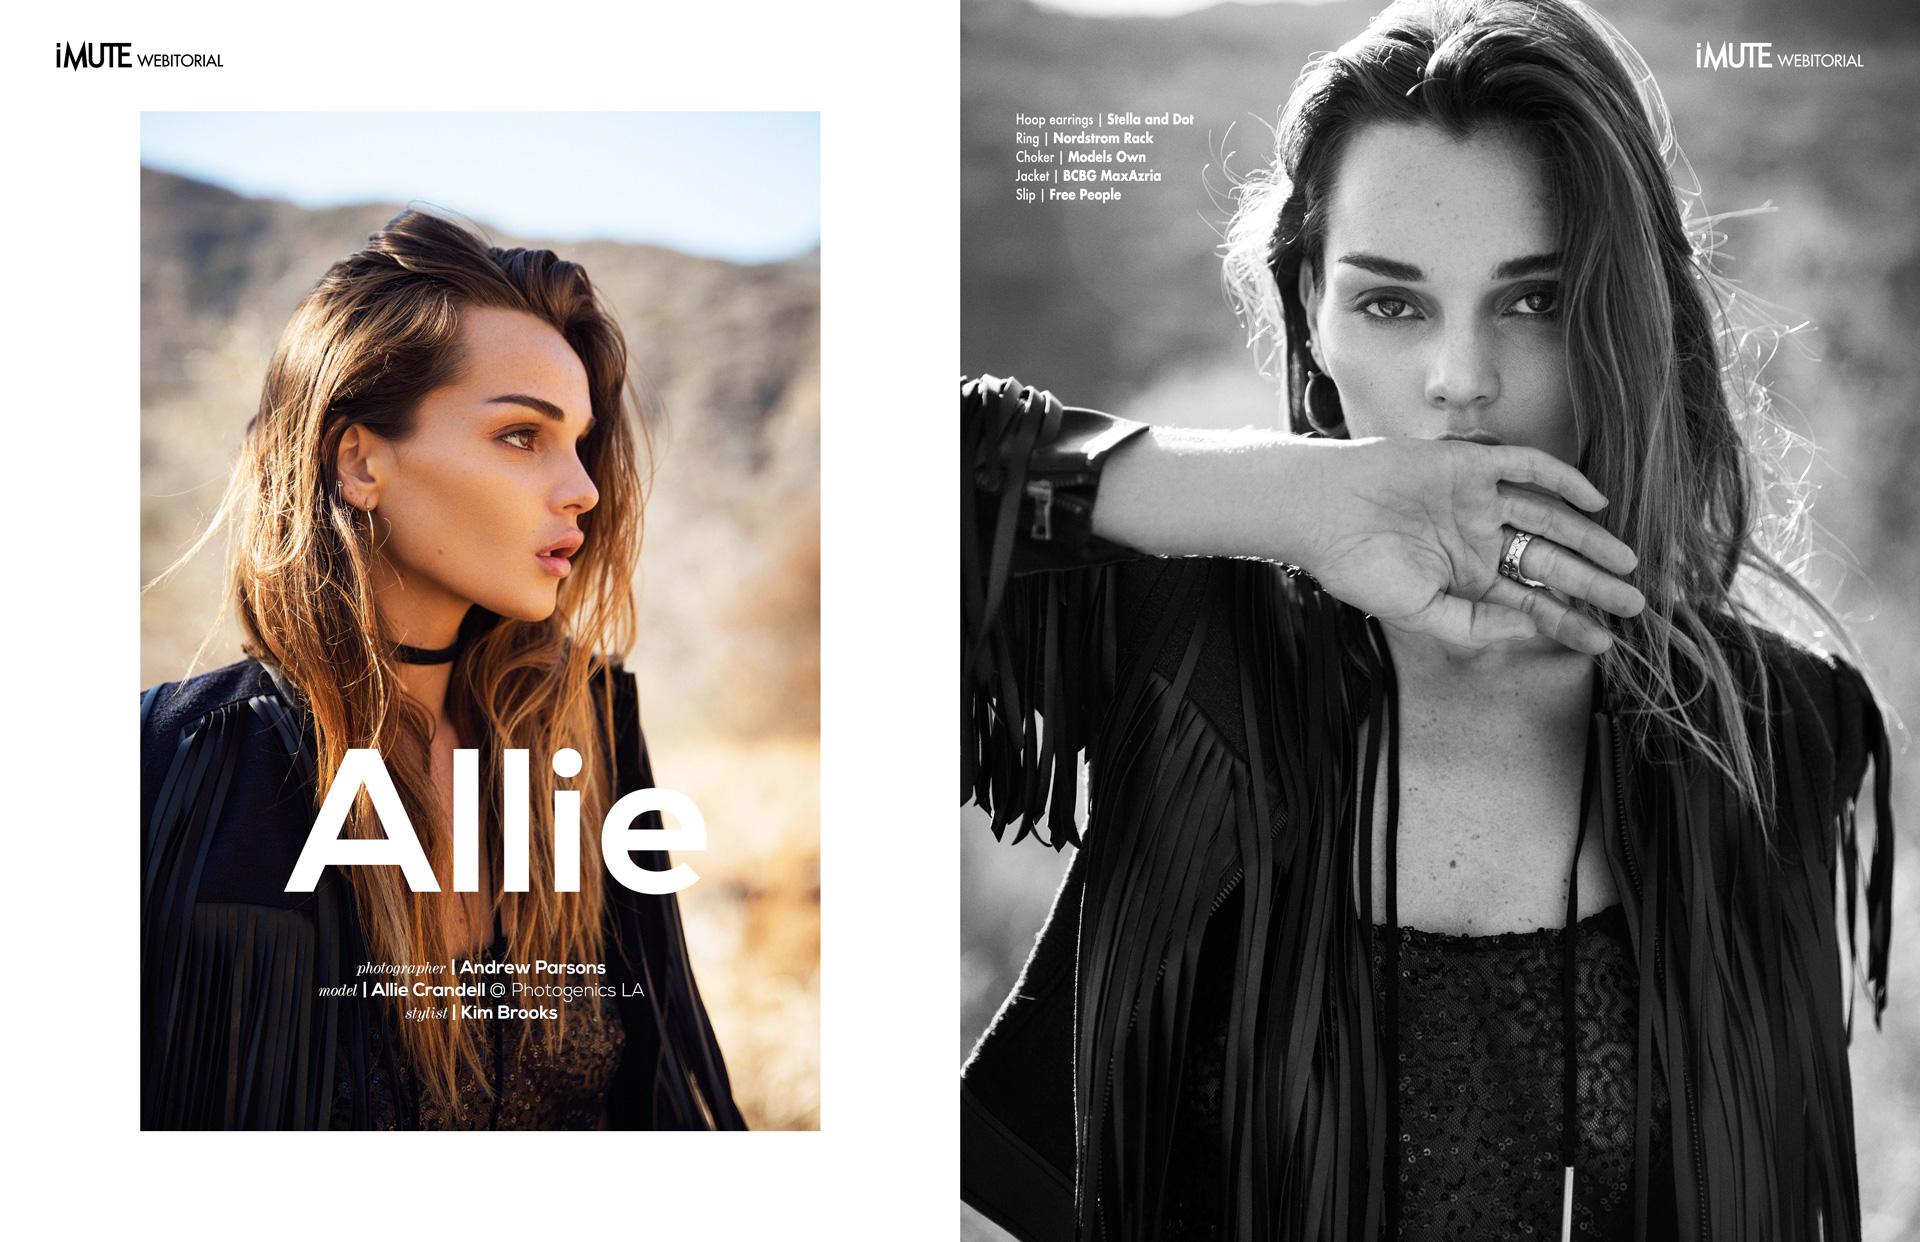 Video Allie Crandell nude photos 2019